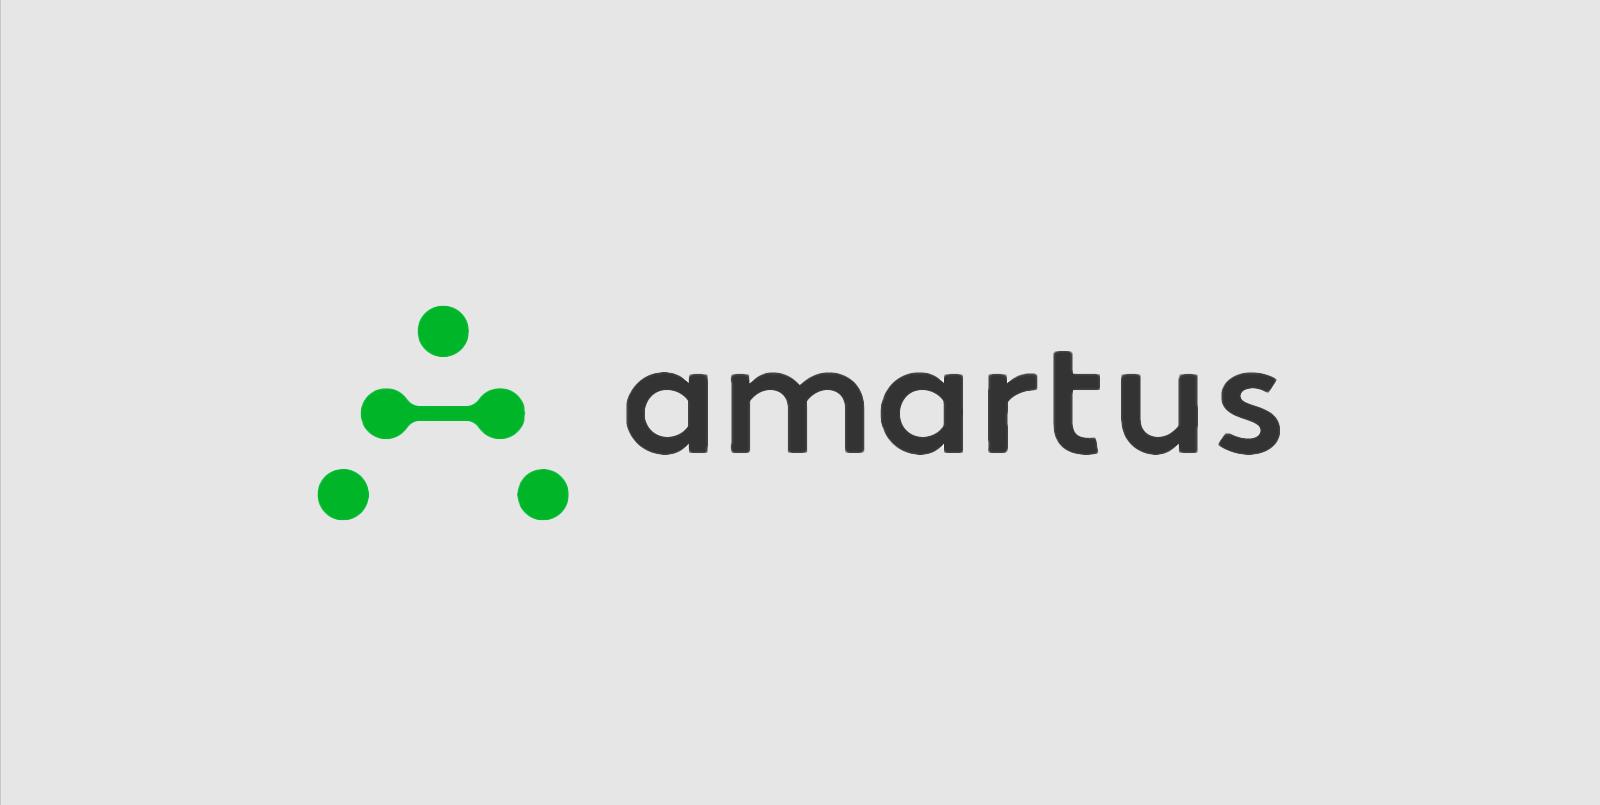 amartus logo news cloudify